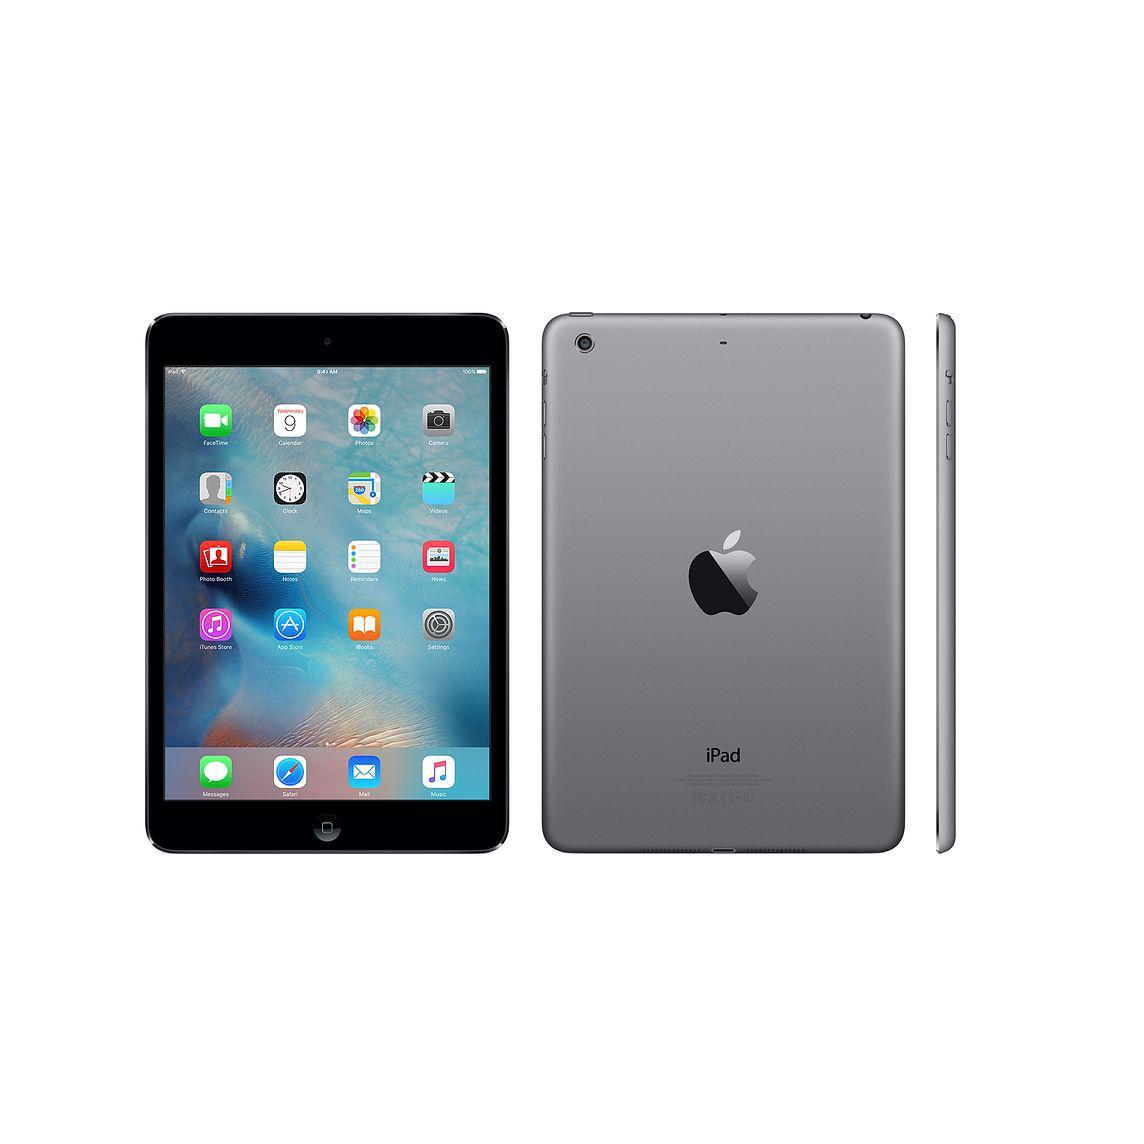 iPad mini 2 (2013) - Wi-Fi + GSM/CDMA + LTE